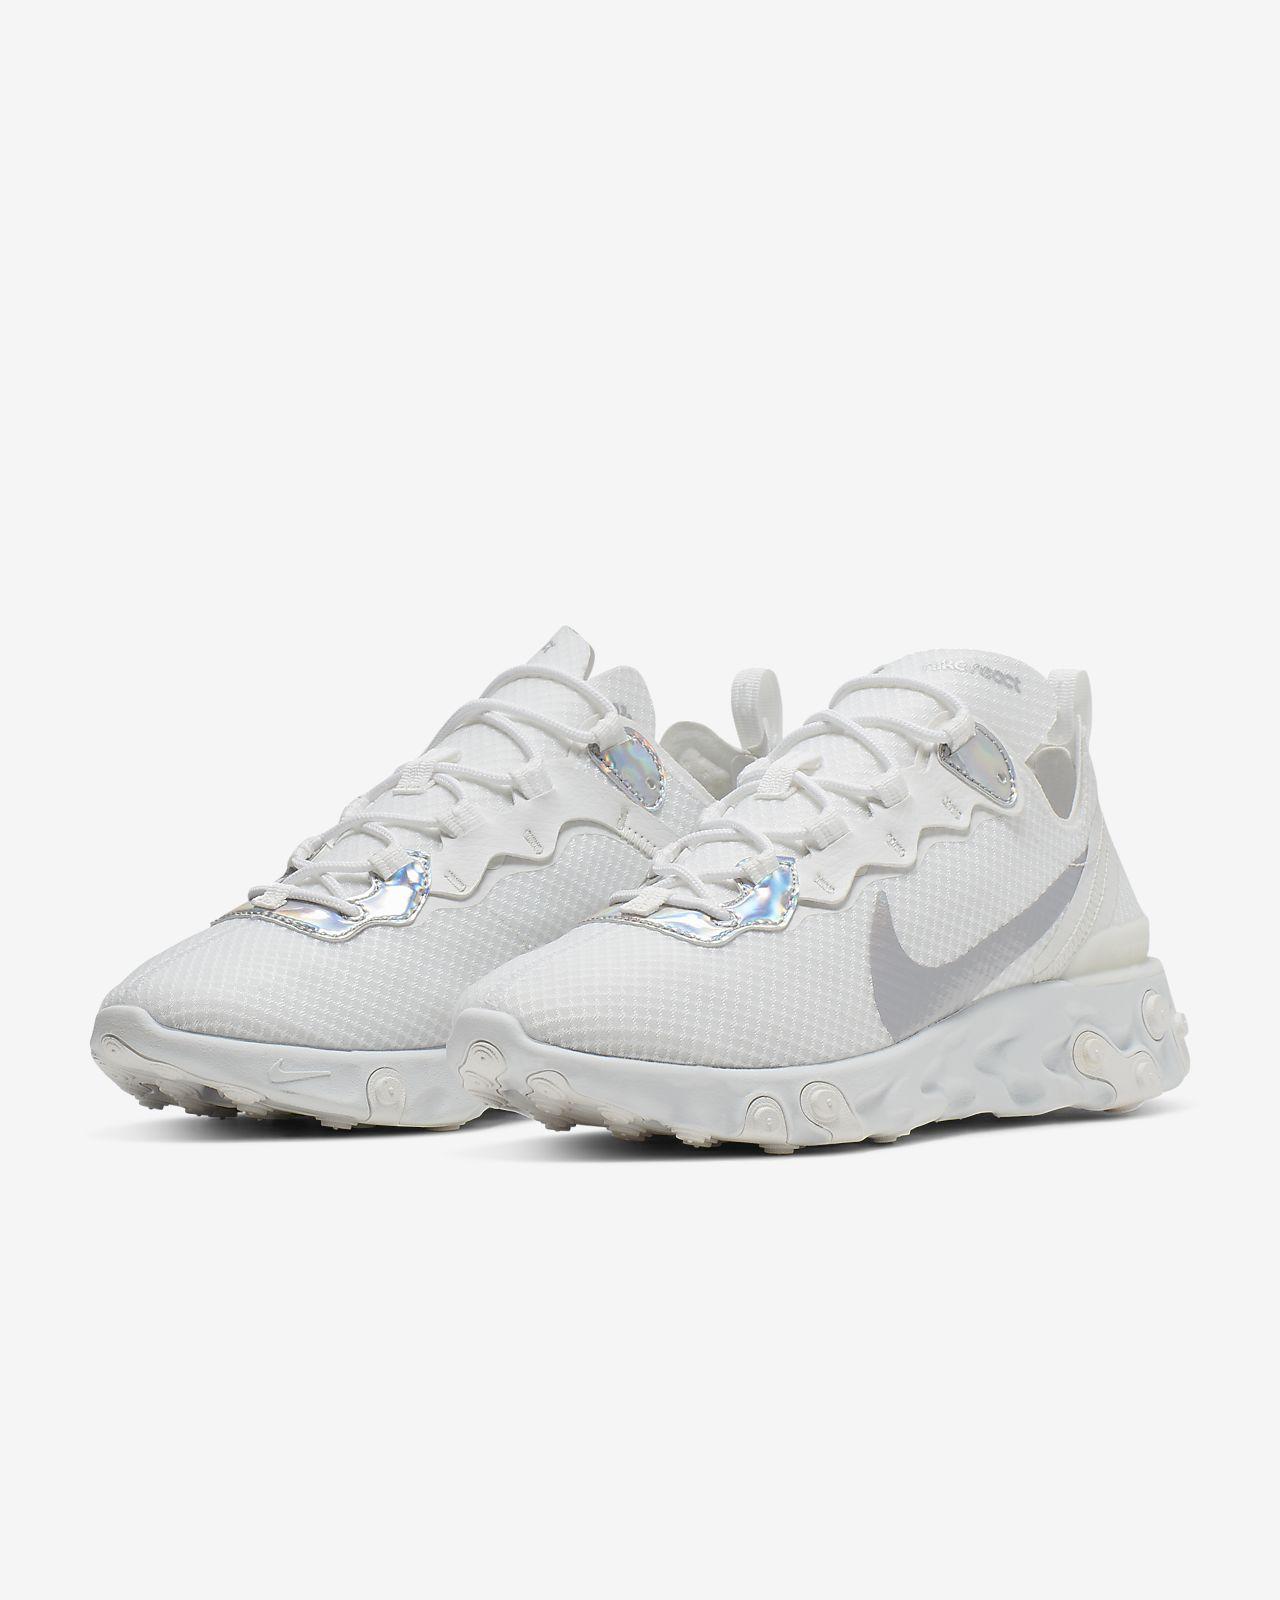 Nike React Element 55 Women's Iridescent Shoe